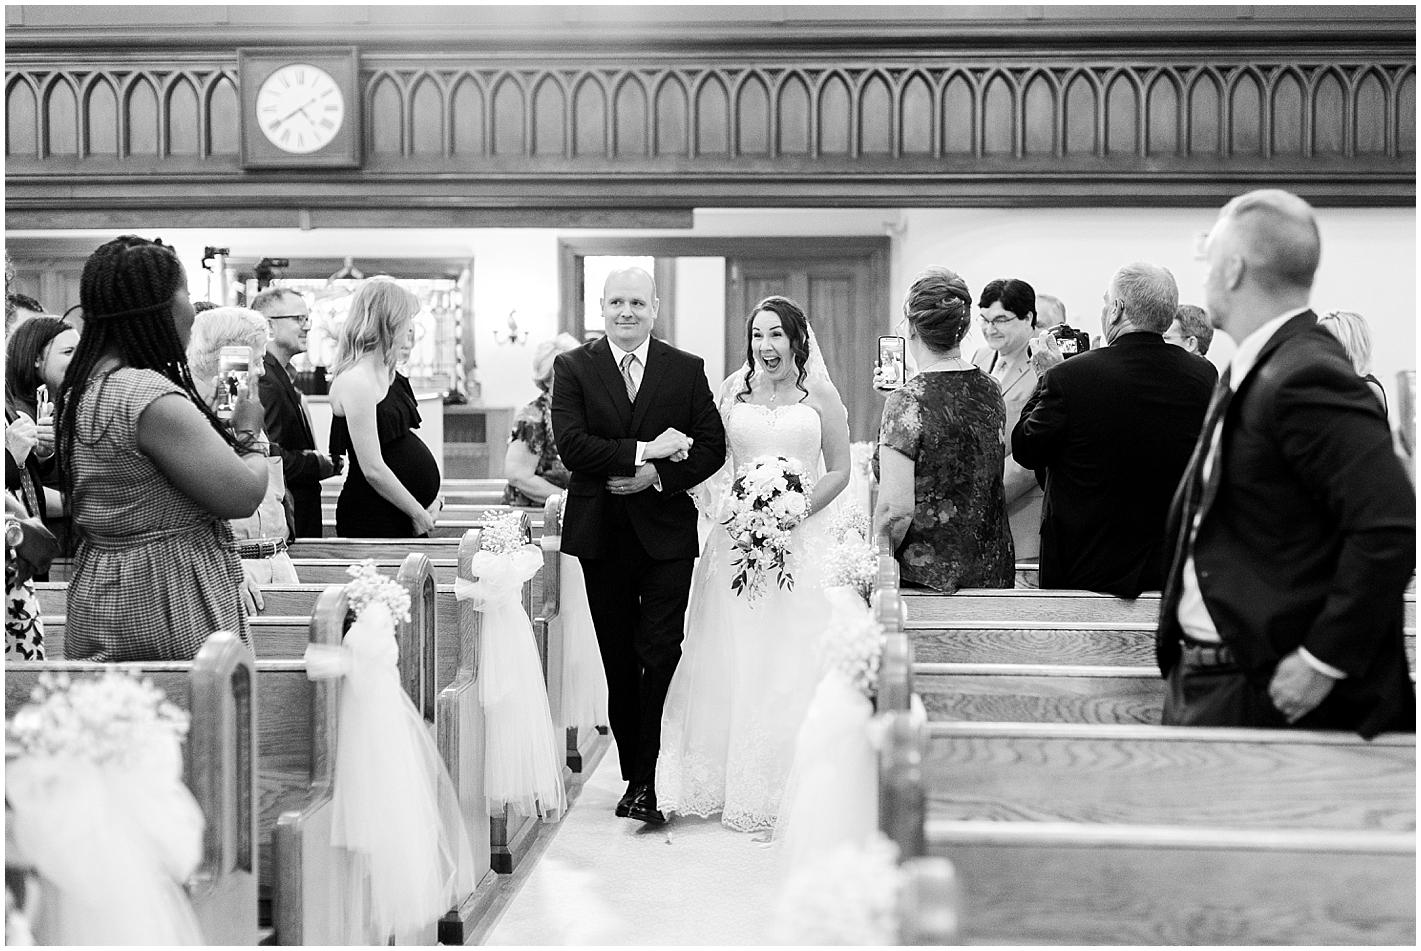 Nashun Methodist church wedding New Hampshire Photos By Alyssa Parker Photography